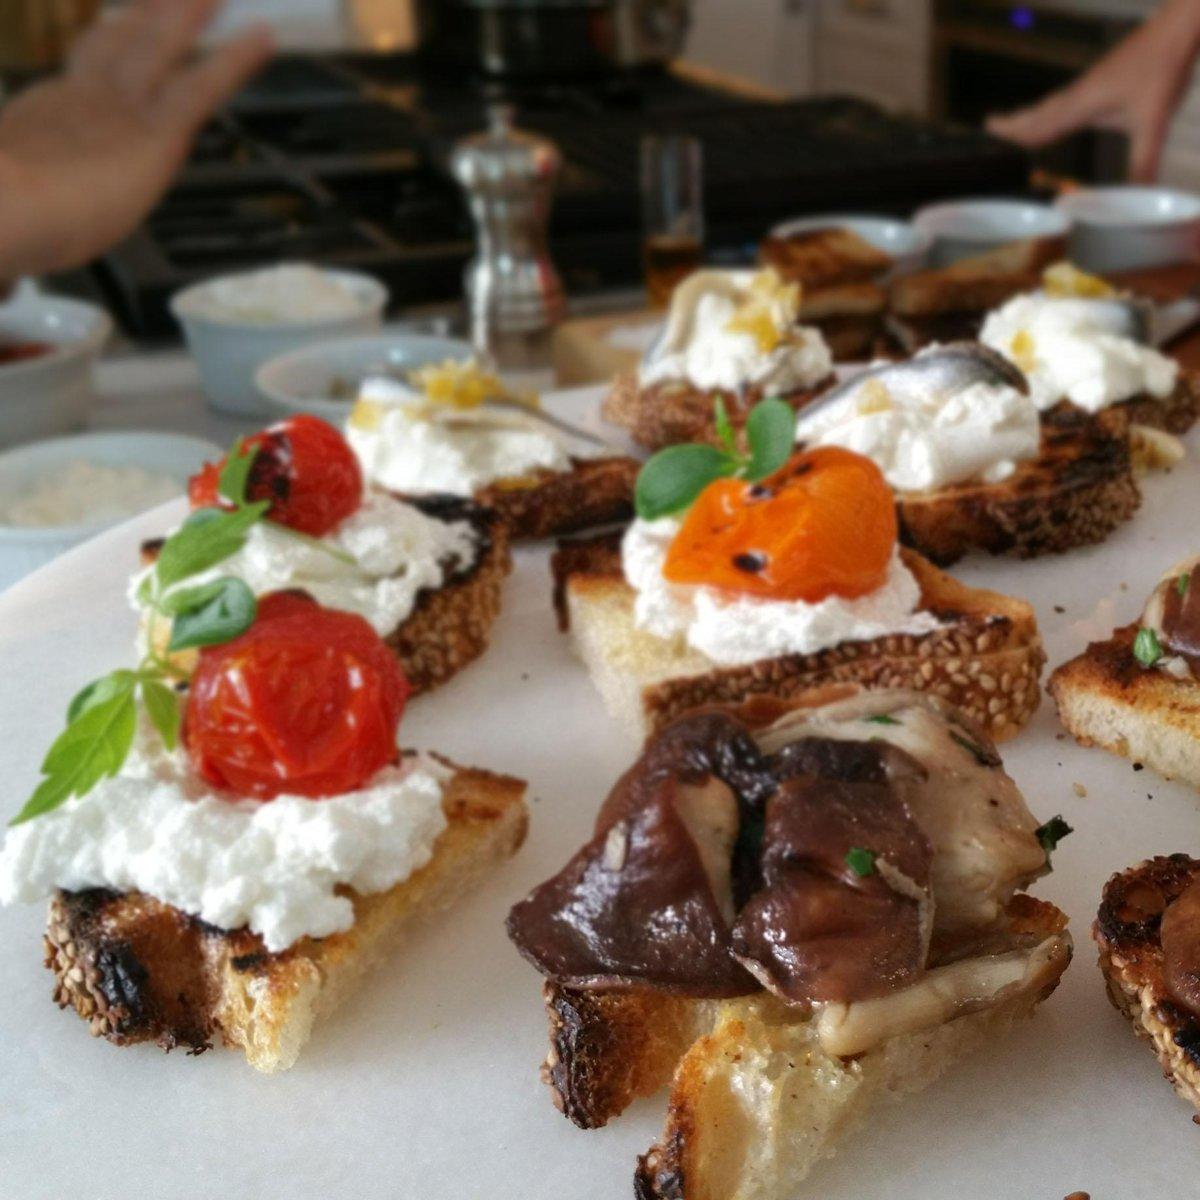 Bruschettas w/ roasted tomato - ricotta & micro basil -  mushrooms & stracciatella with anchovies & lemon zest. http://t.co/eV9QpJ32Bg